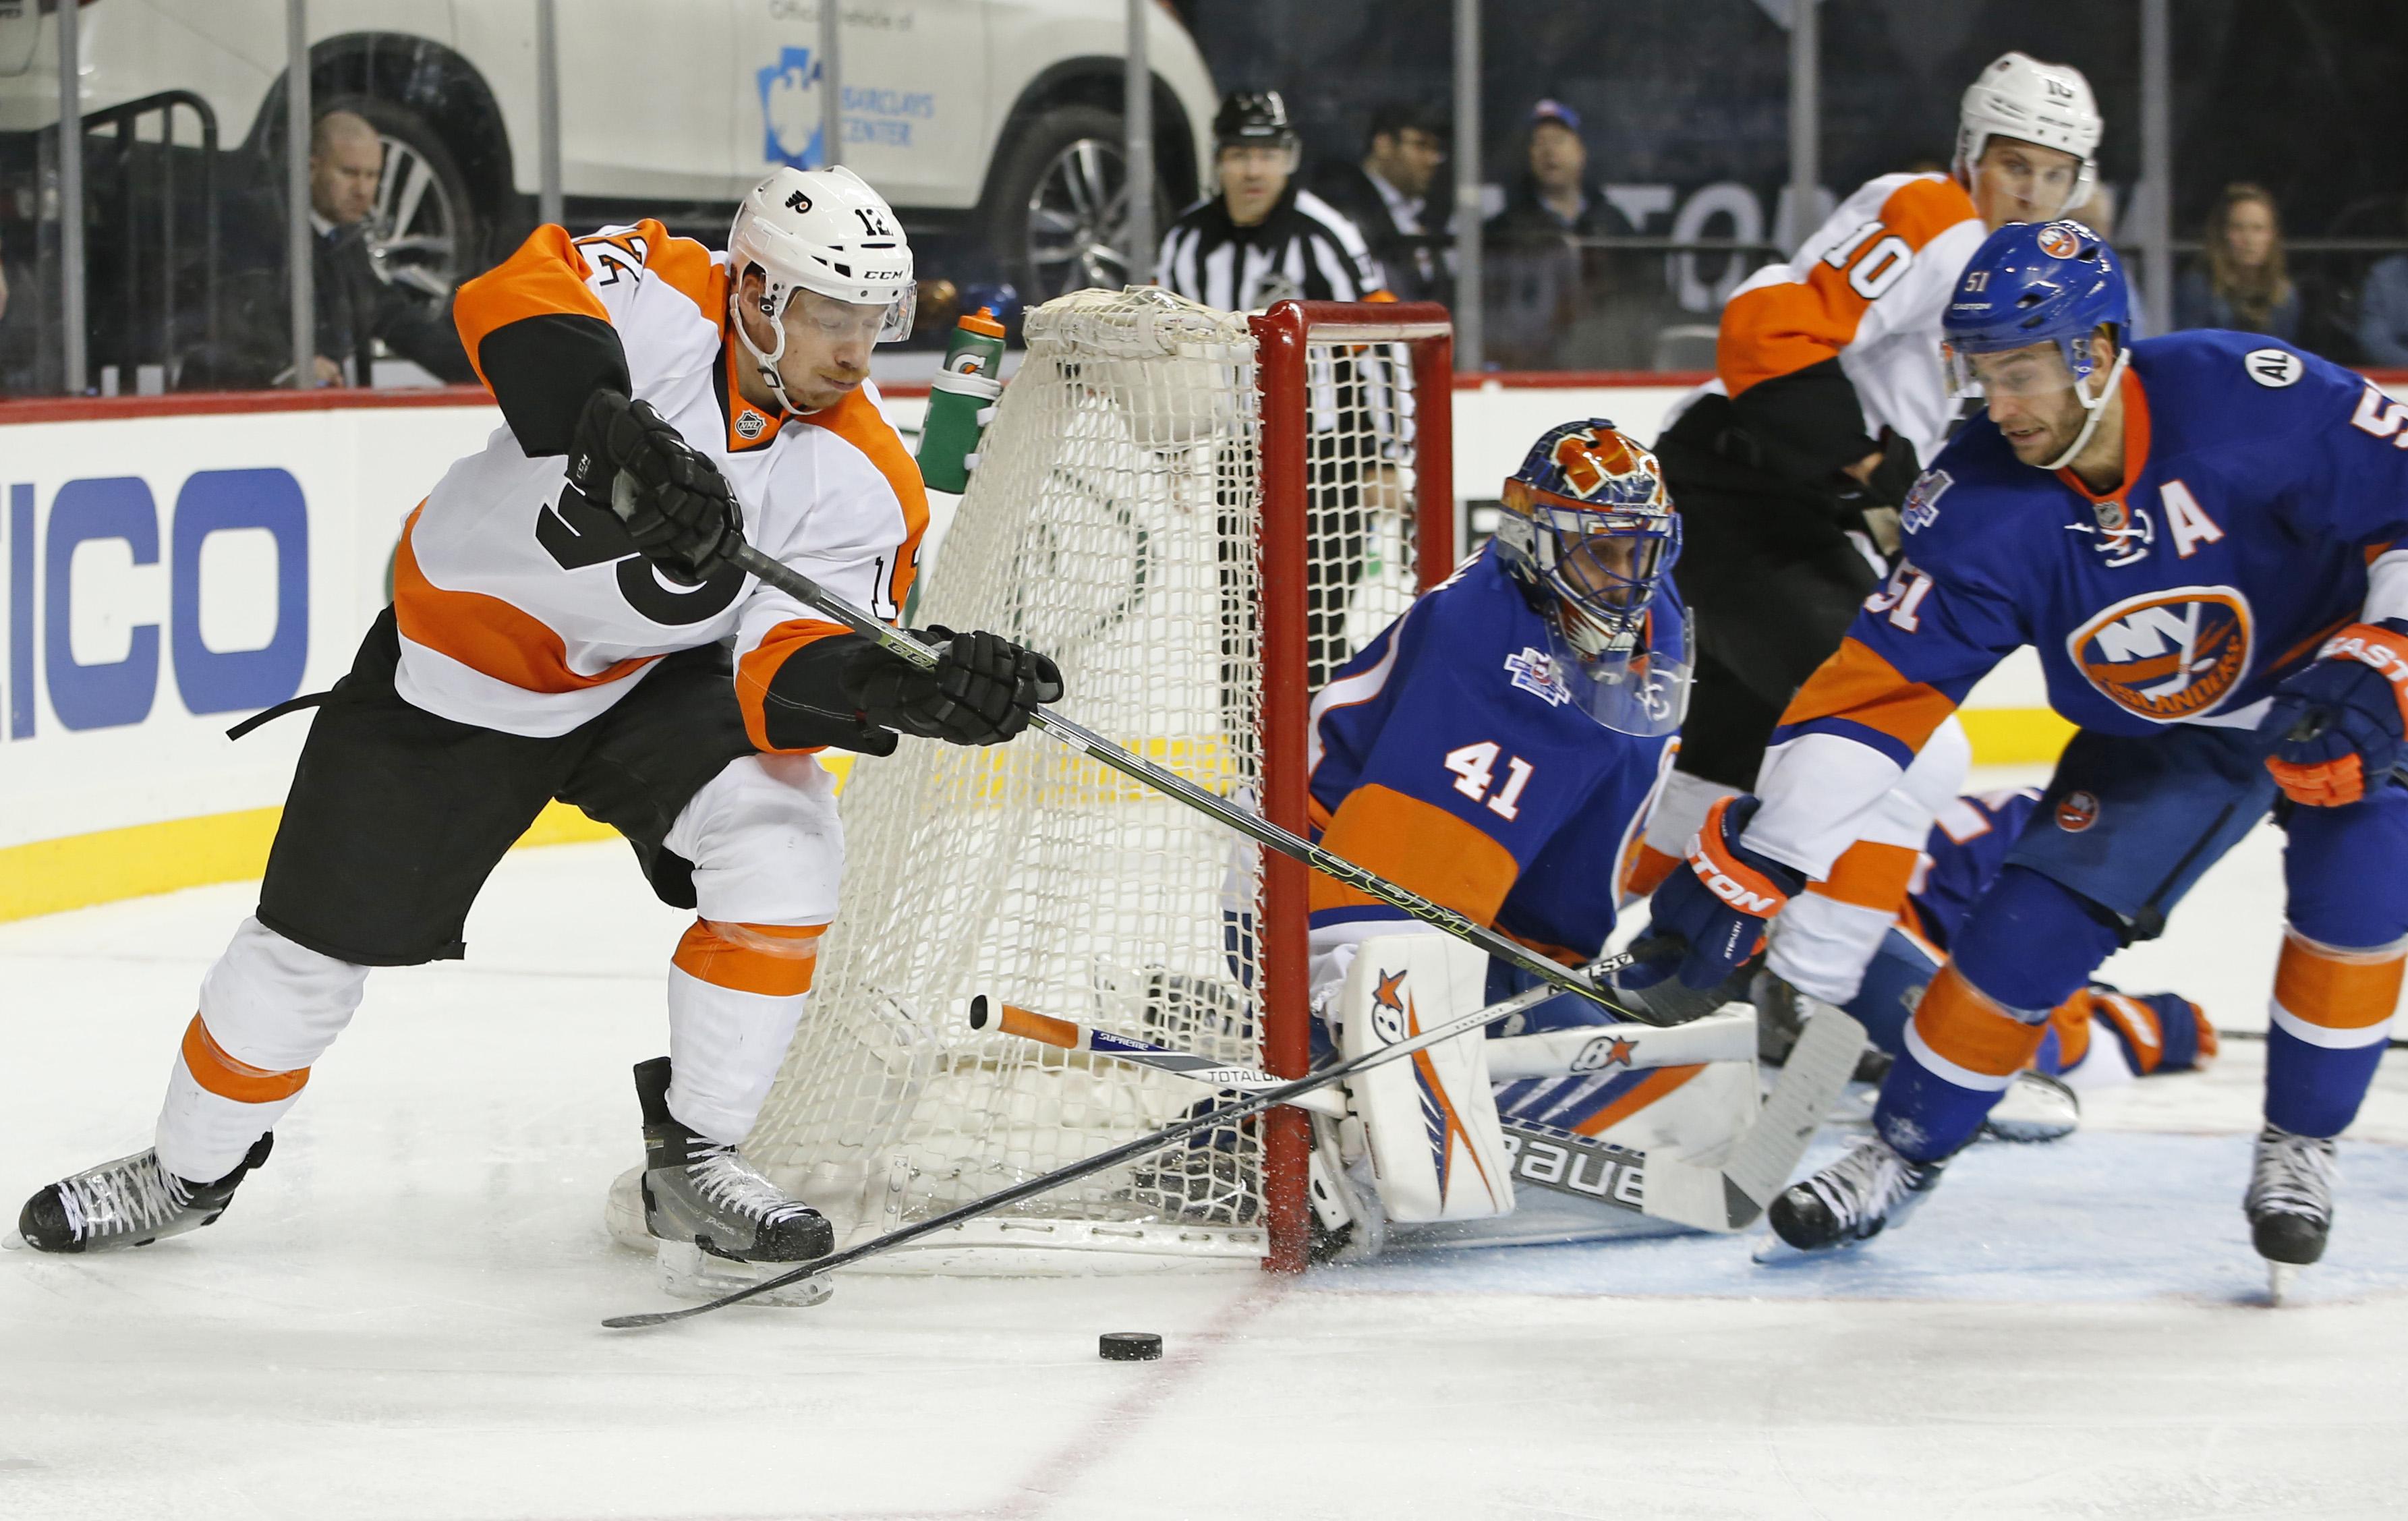 New York Islanders center Frans Nielsen (51) of Denmark defends Philadelphia Flyers left wing Michael Raffl (12) of Austria as New York Islanders goalie Jaroslav Halak (41) of Slovakia keeps his eye on the puck in the third period of an NHL hockey game in